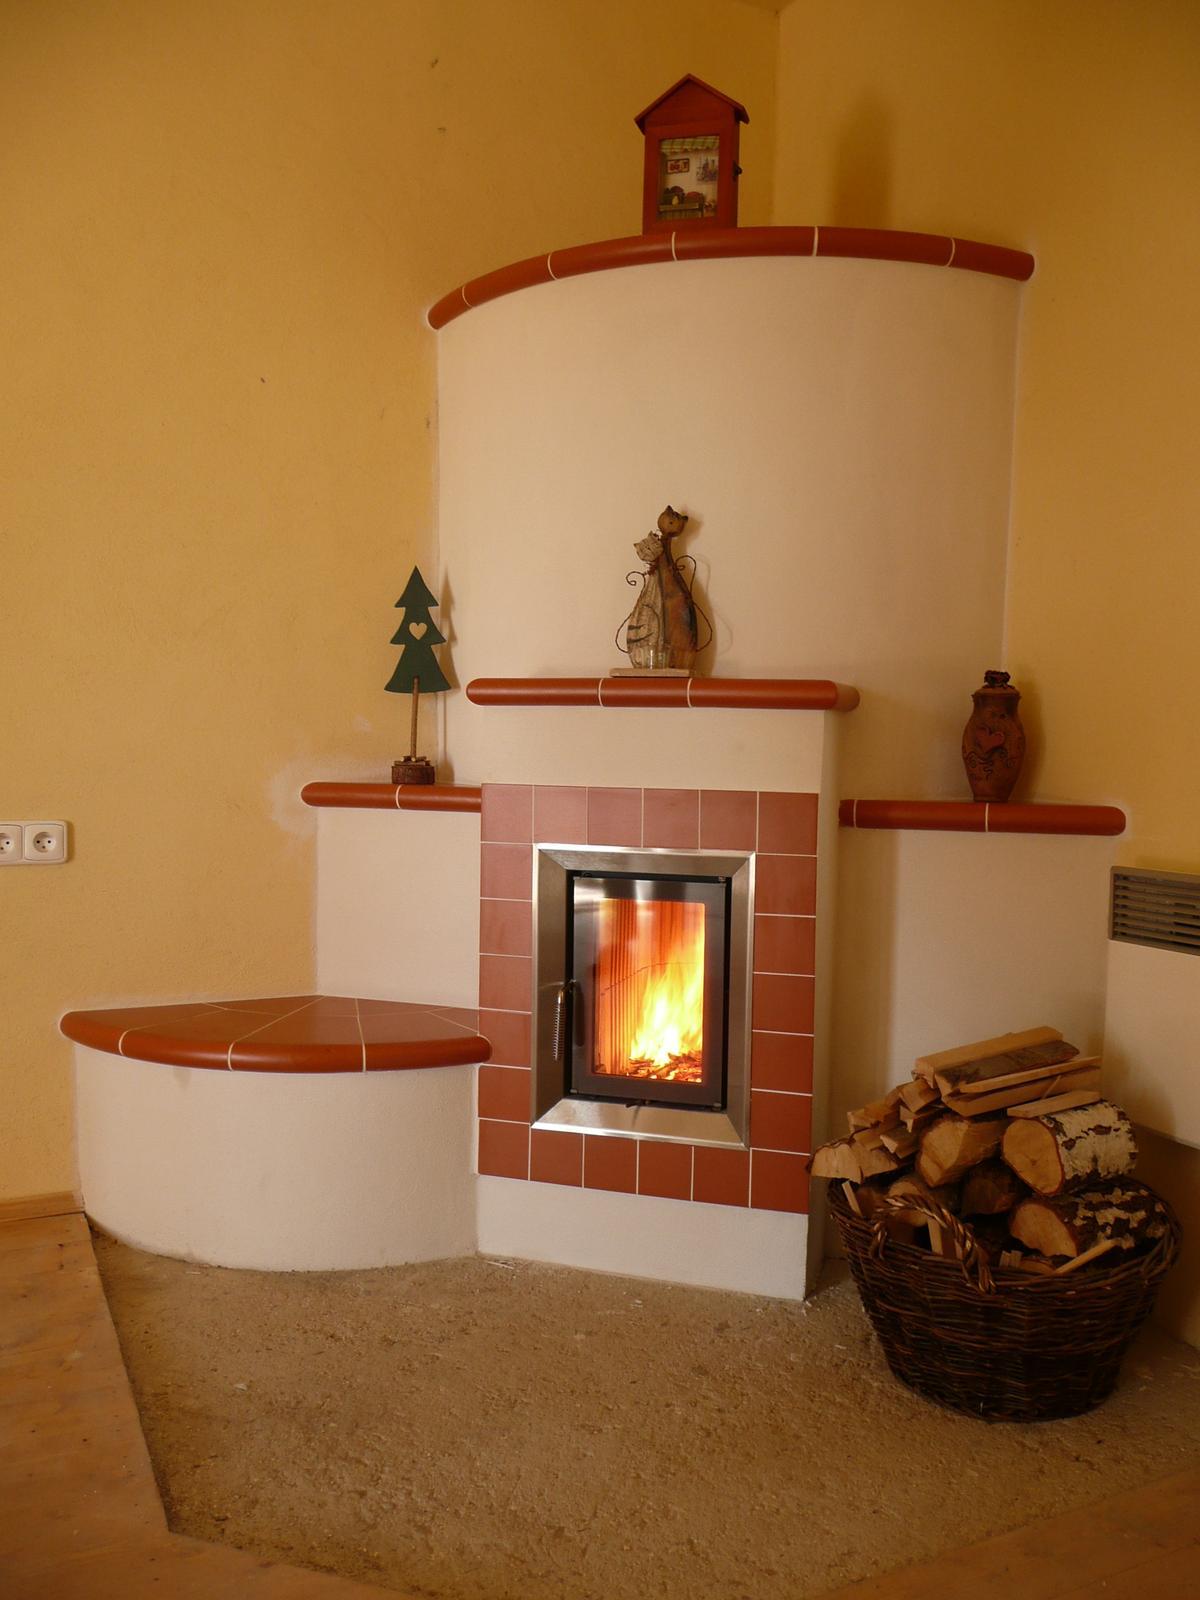 Naša práca - Kachľová pec BRUNNER, keramika Kerkotherm